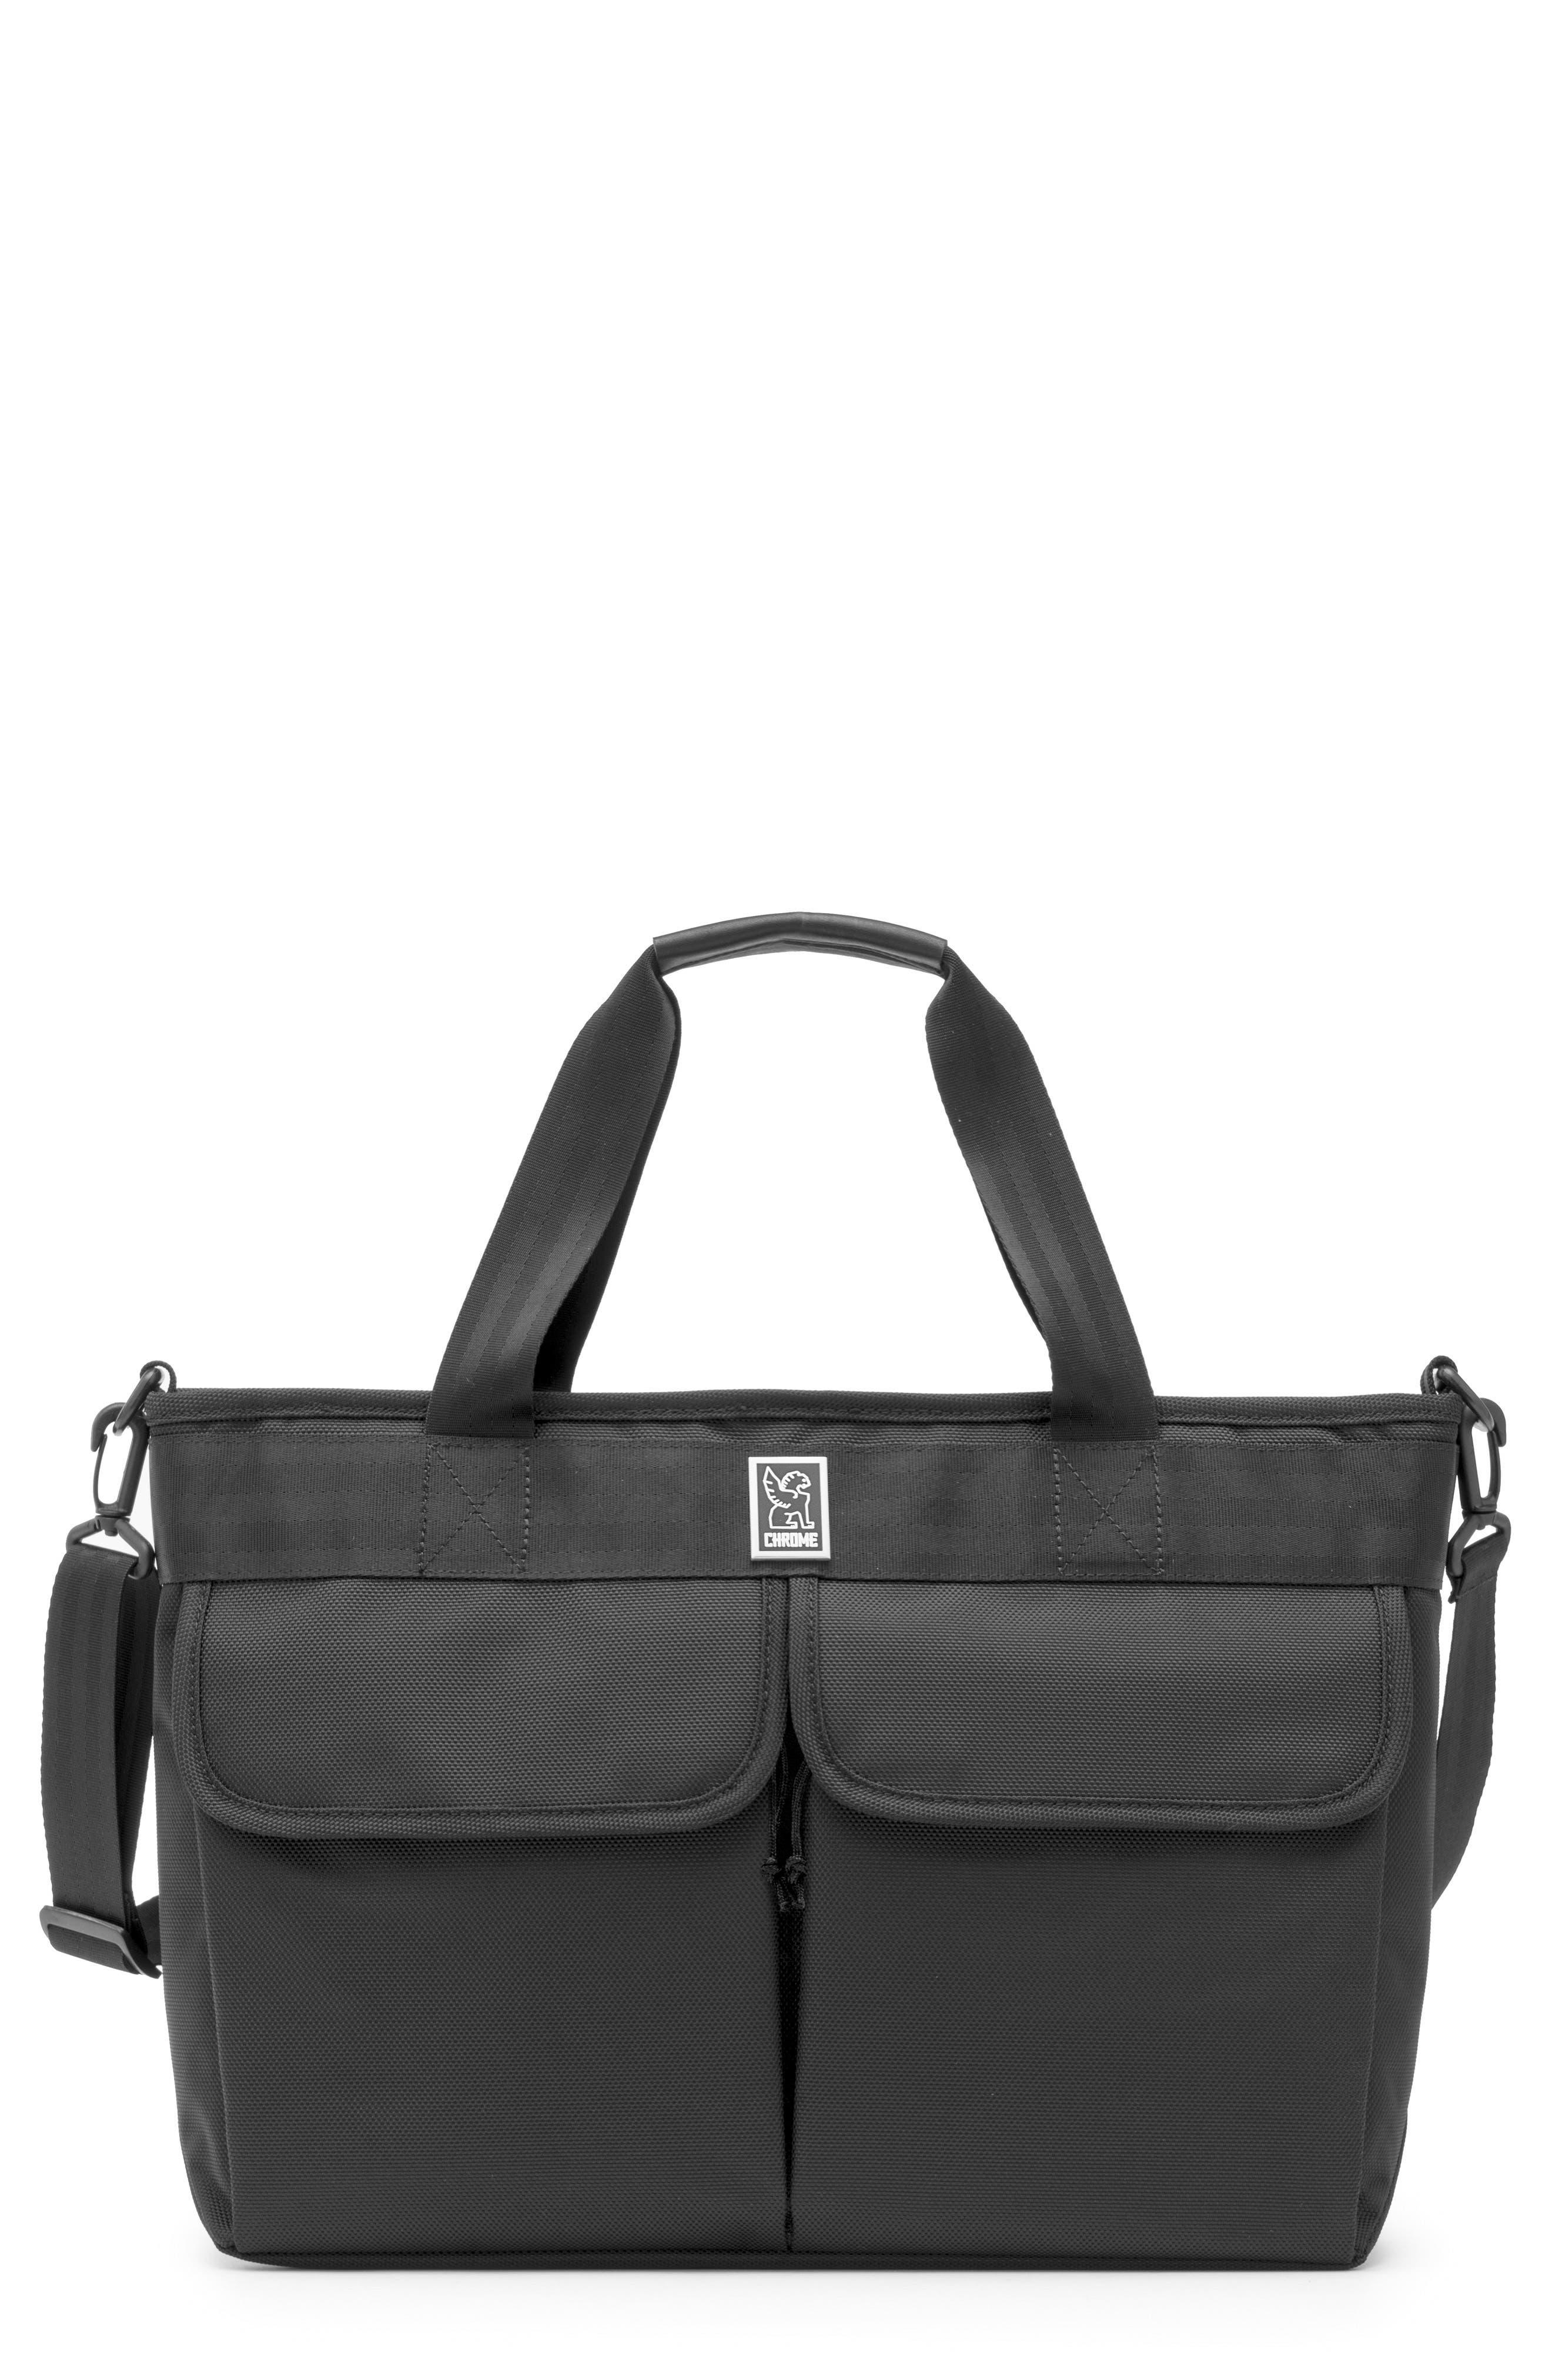 Juno Travel Tote Bag,                             Main thumbnail 1, color,                             All Black